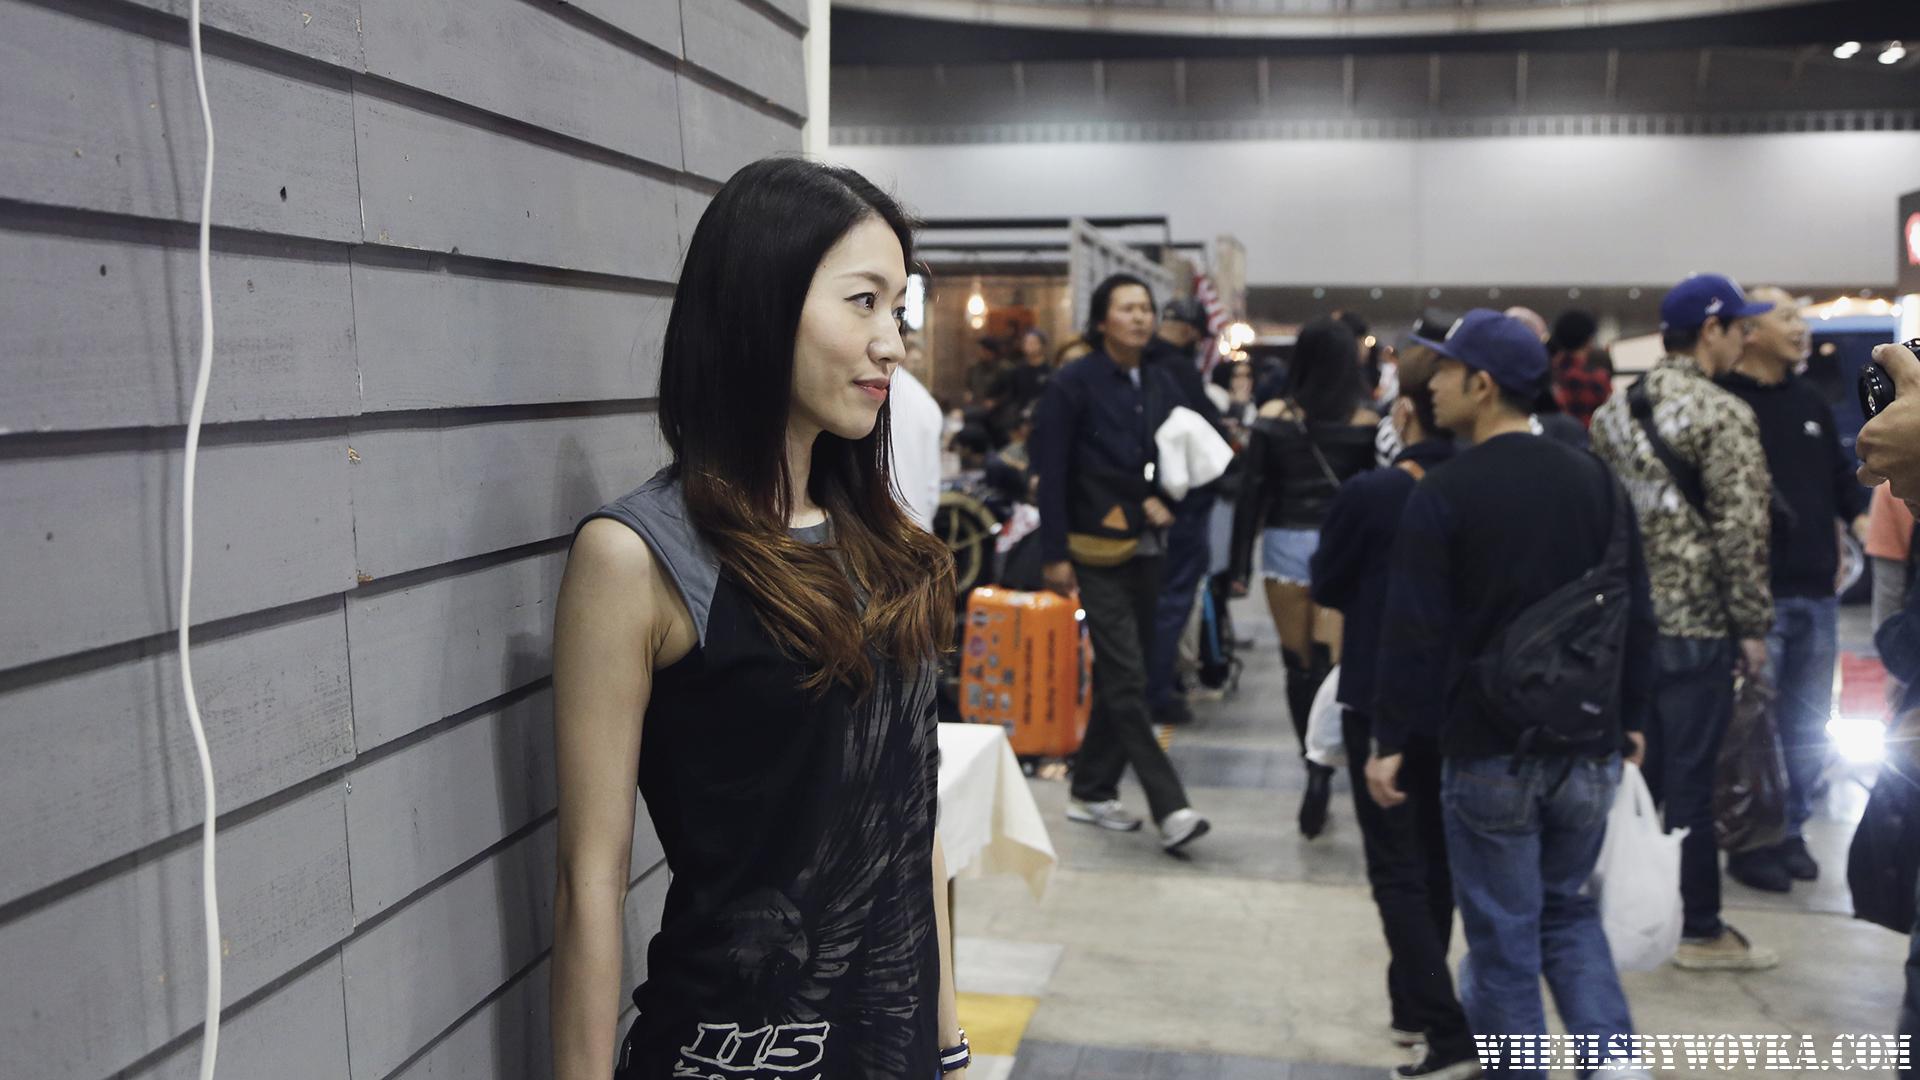 mooneyes-yokohama-hot-rod-custom-show-guests-2017-13